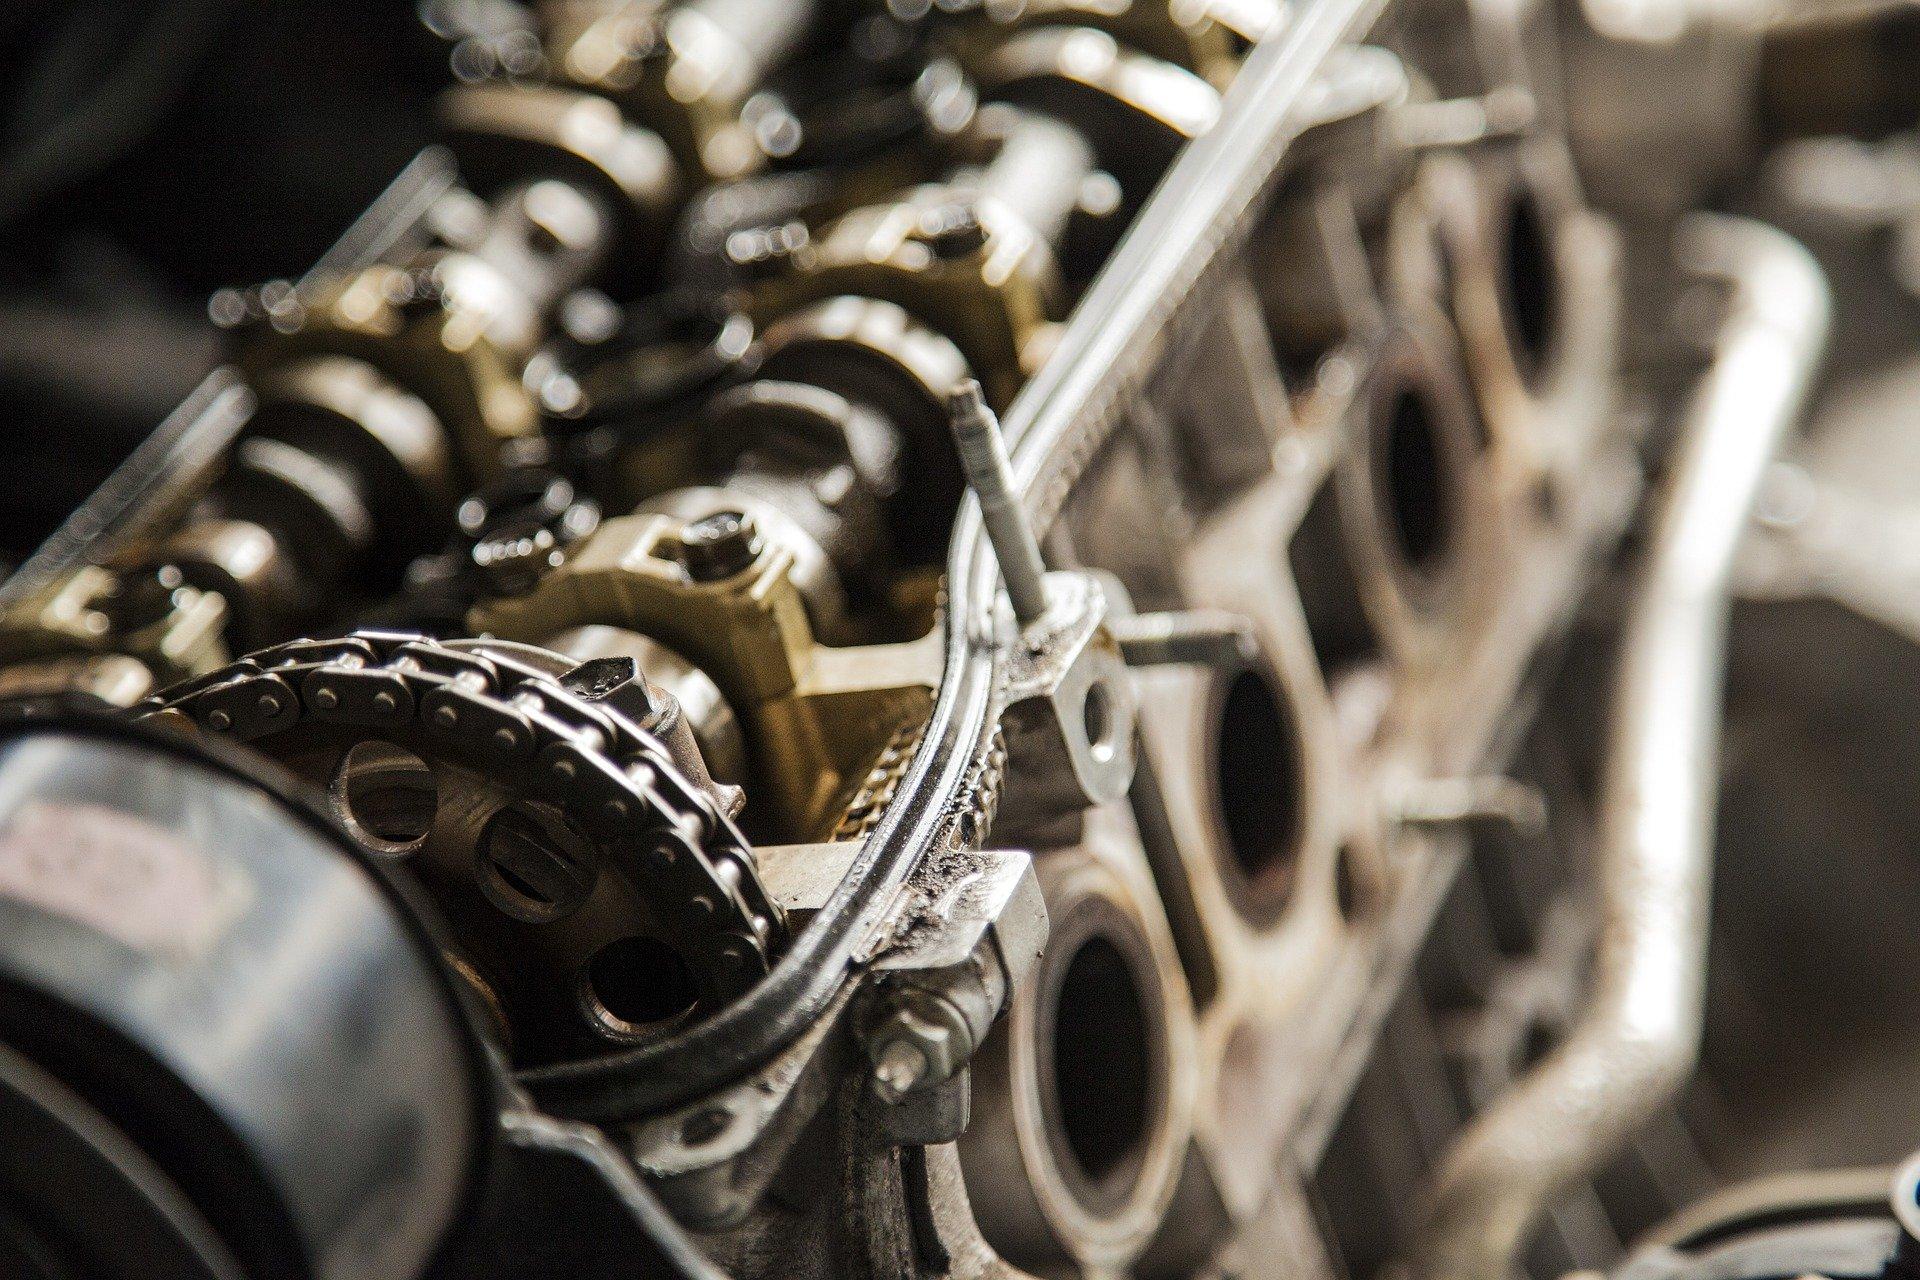 Close up of a motor